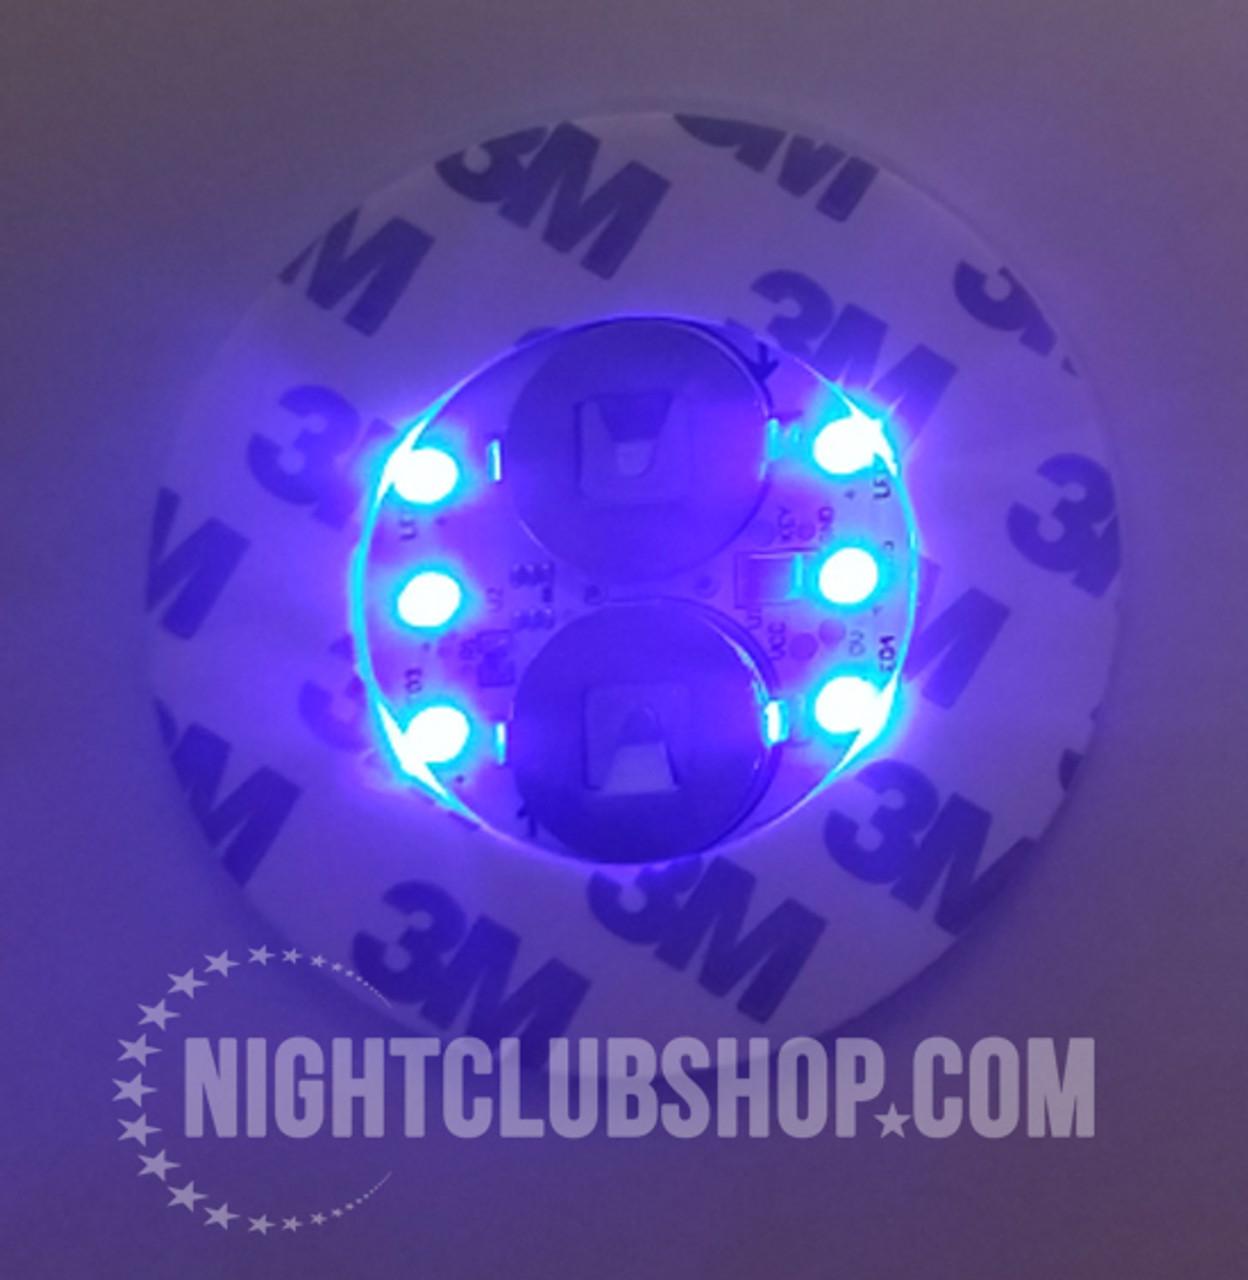 LED Bottle Glow, LED, Bottle, Bright, Light, illuminate, Glorifier, make bottle, light up, glowing, liquor, Belvedere,Blue,Blue LED, Blue Glow